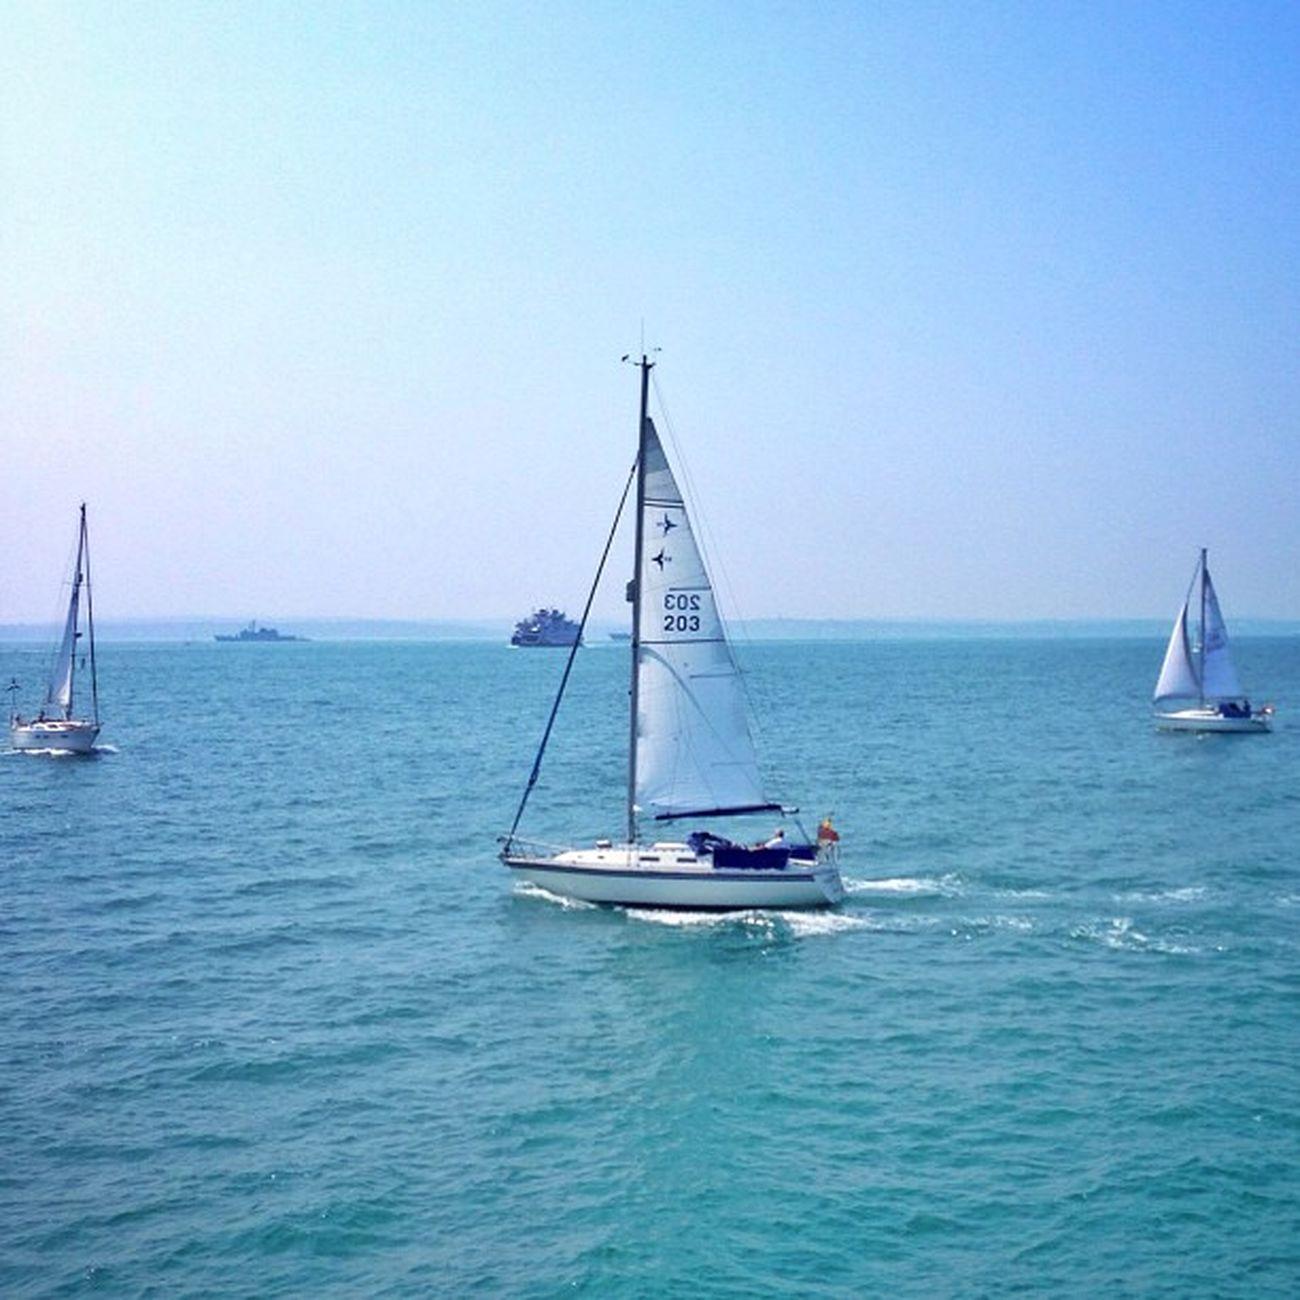 Another #regatta on #IsleOfWight coast ☀️???⛵️⛵️⛵️#aauk #allshots_ #sea #britishsummer #capture_today #englishchannel #gi_uk #gf_uk #gang_family #ig_england #o2travel #summer #YourTurnBritain #royalisland Loveyoursummer Yourturnbritain Summer Englishchannel Sea Isleofwight Gang_family Royalisland Britishsummer Regatta Allshots_ Gf_uk O2travel Gi_uk Ig_england Aauk Printmyfeedhappydays Capture_today